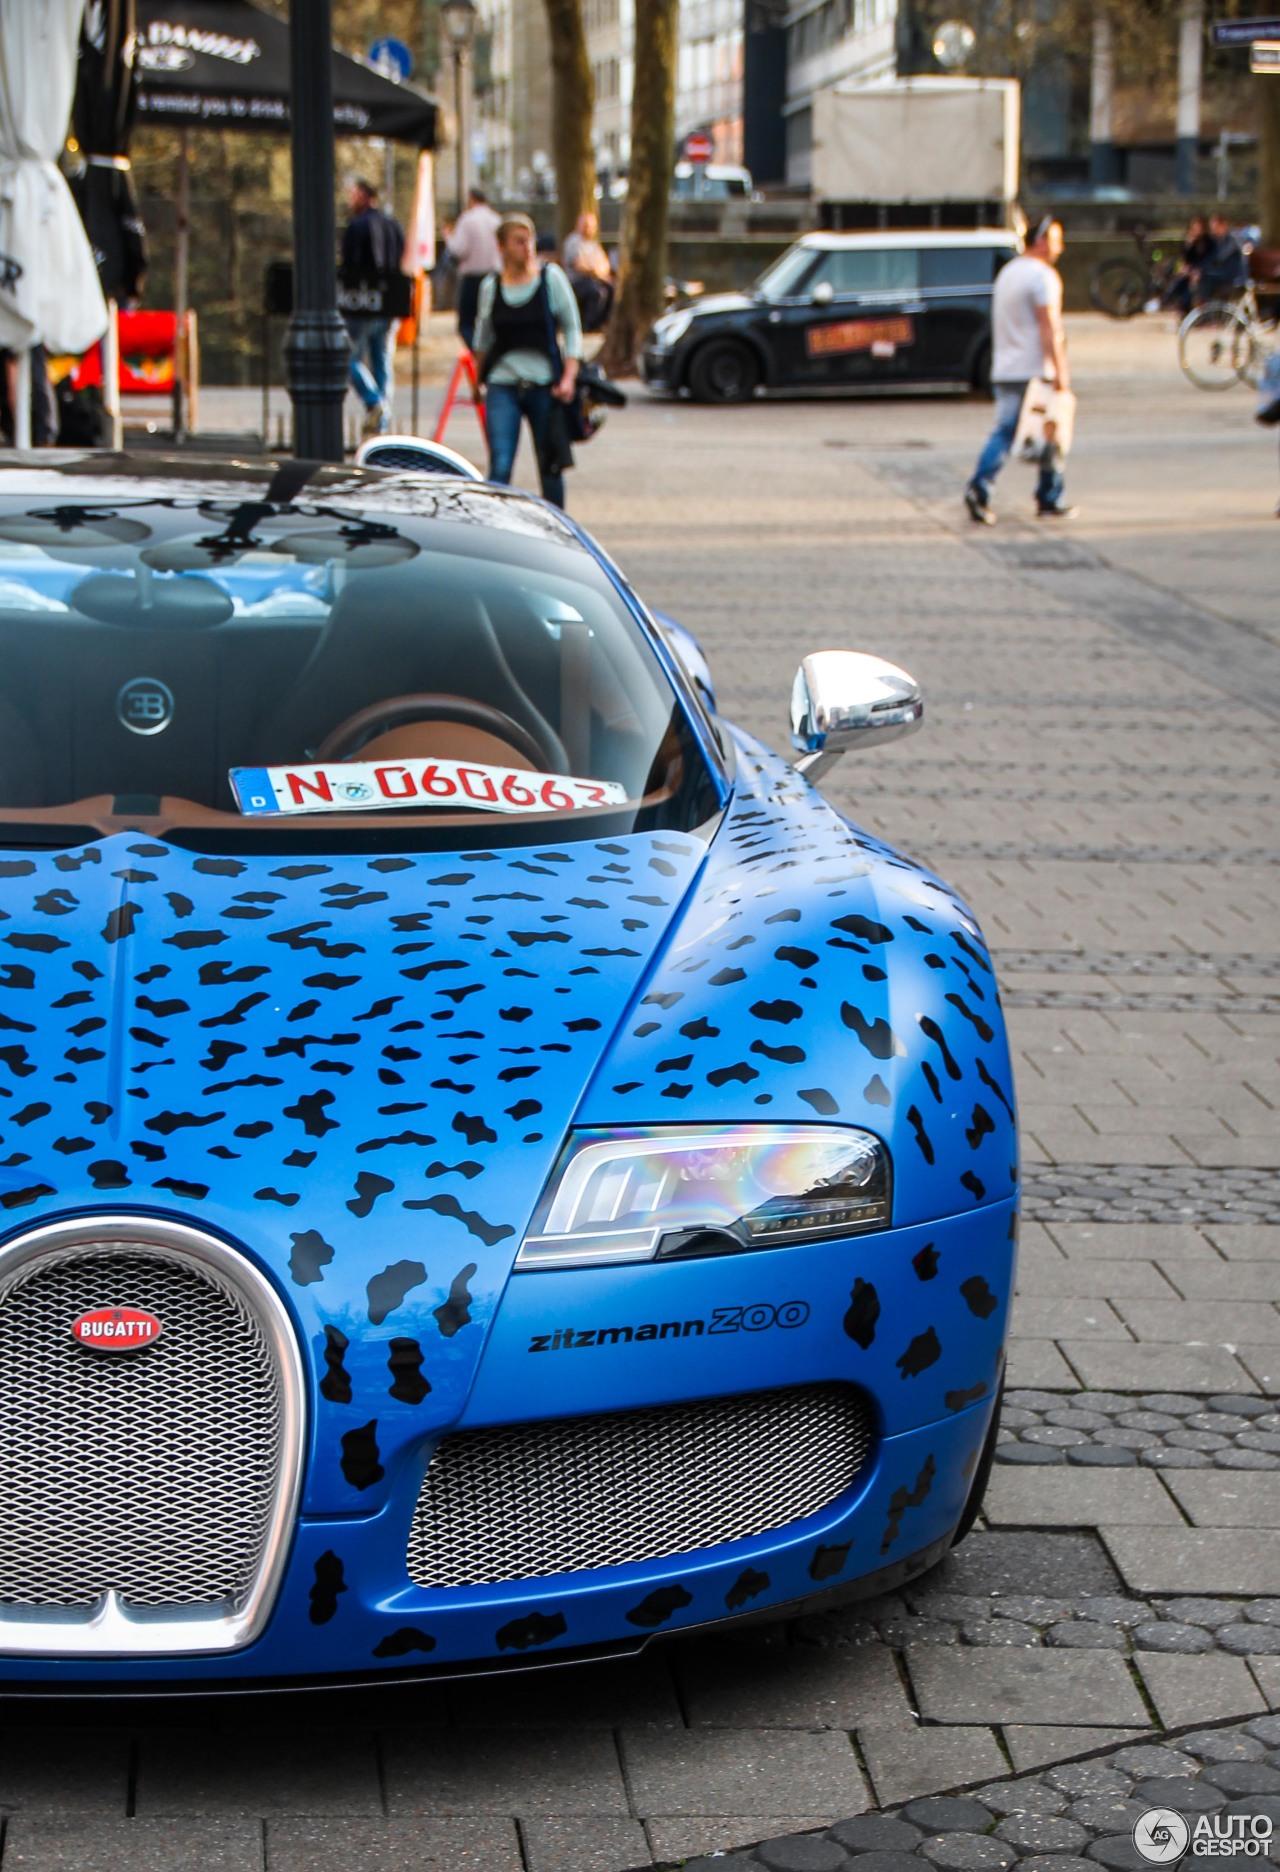 bugatti-veyron-164-bleu-centenaire-c285601042017234454_6 Stunning Bugatti Veyron Price In Brazil Cars Trend